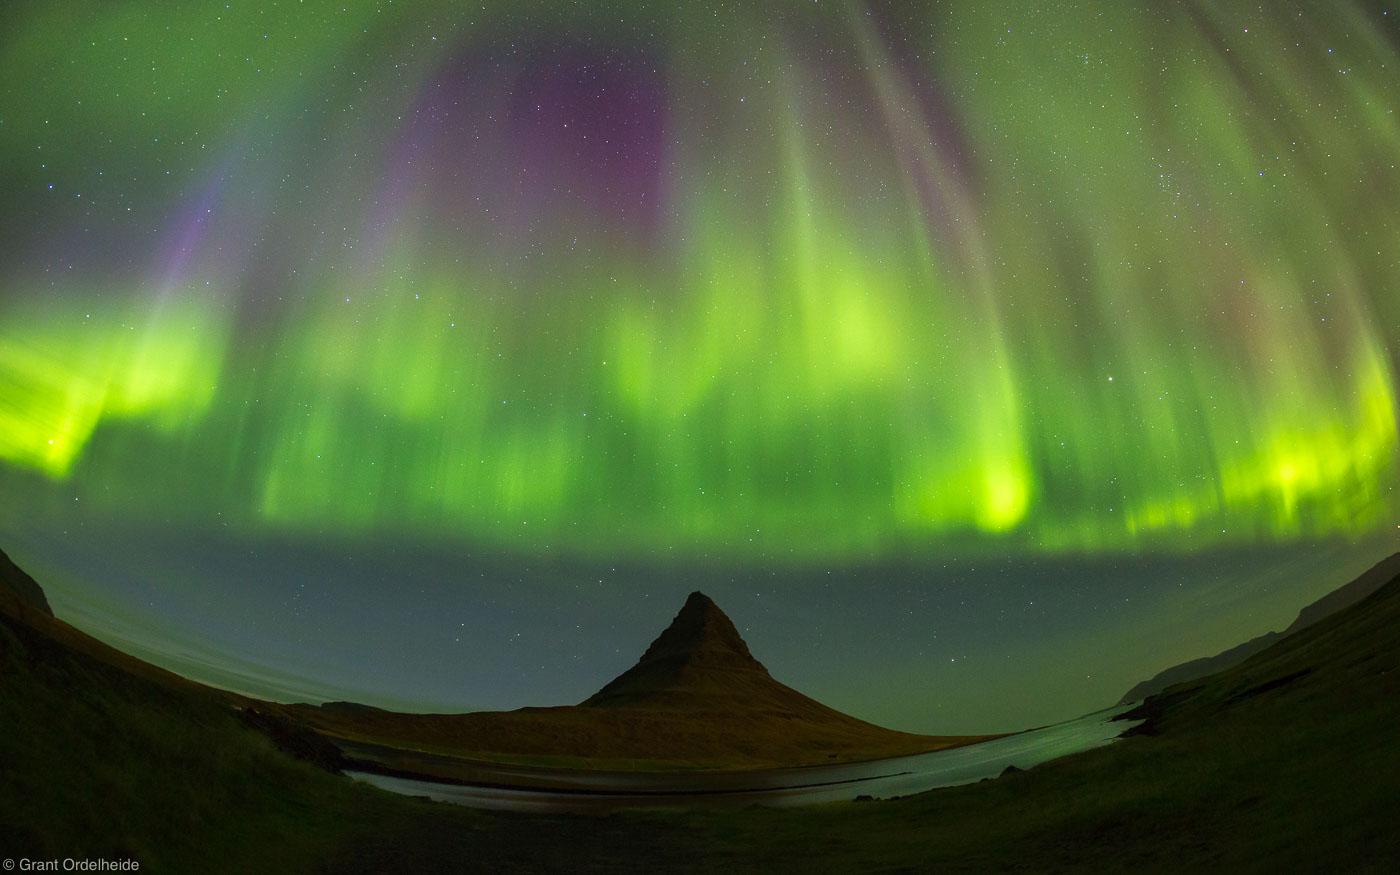 Snæfellsnes ,Grundarfjörður, Iceland, aurora, curtain, colorful, borealis, kirkjufell, moutain, peninsula, western,, photo